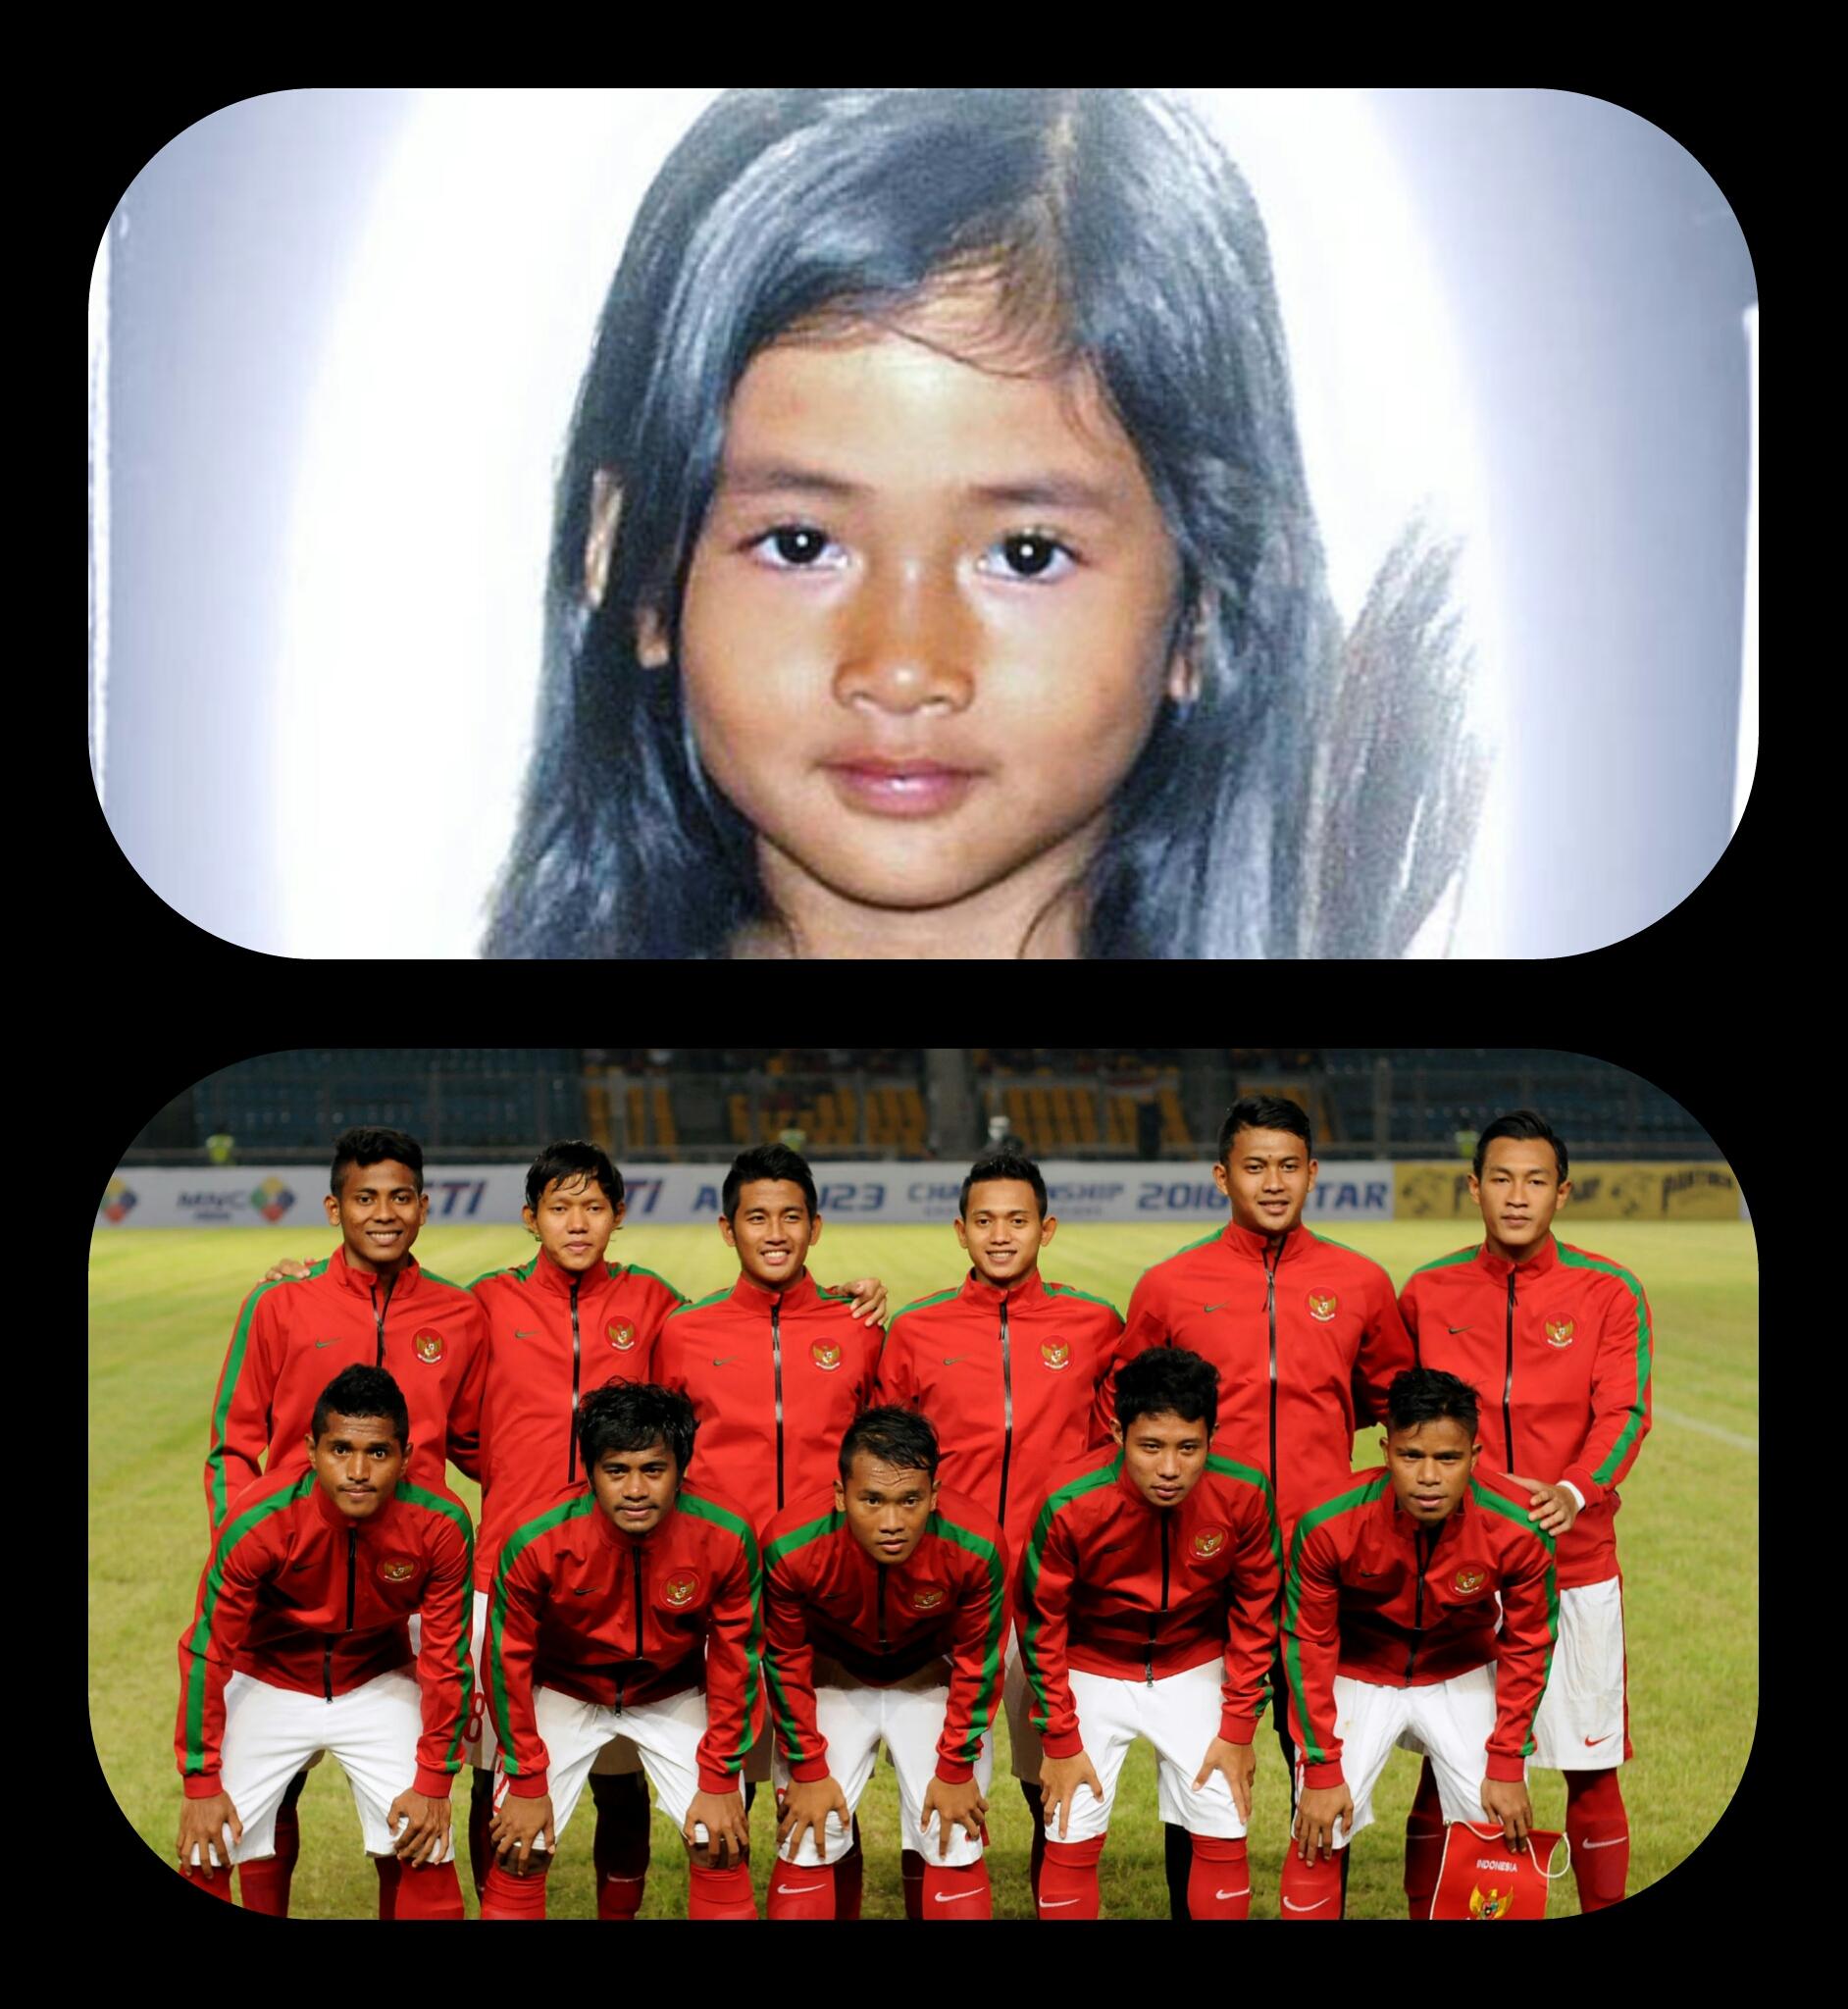 Selamat Jalan Angeline, Selamat Jalan Timnas Indonesia U-23